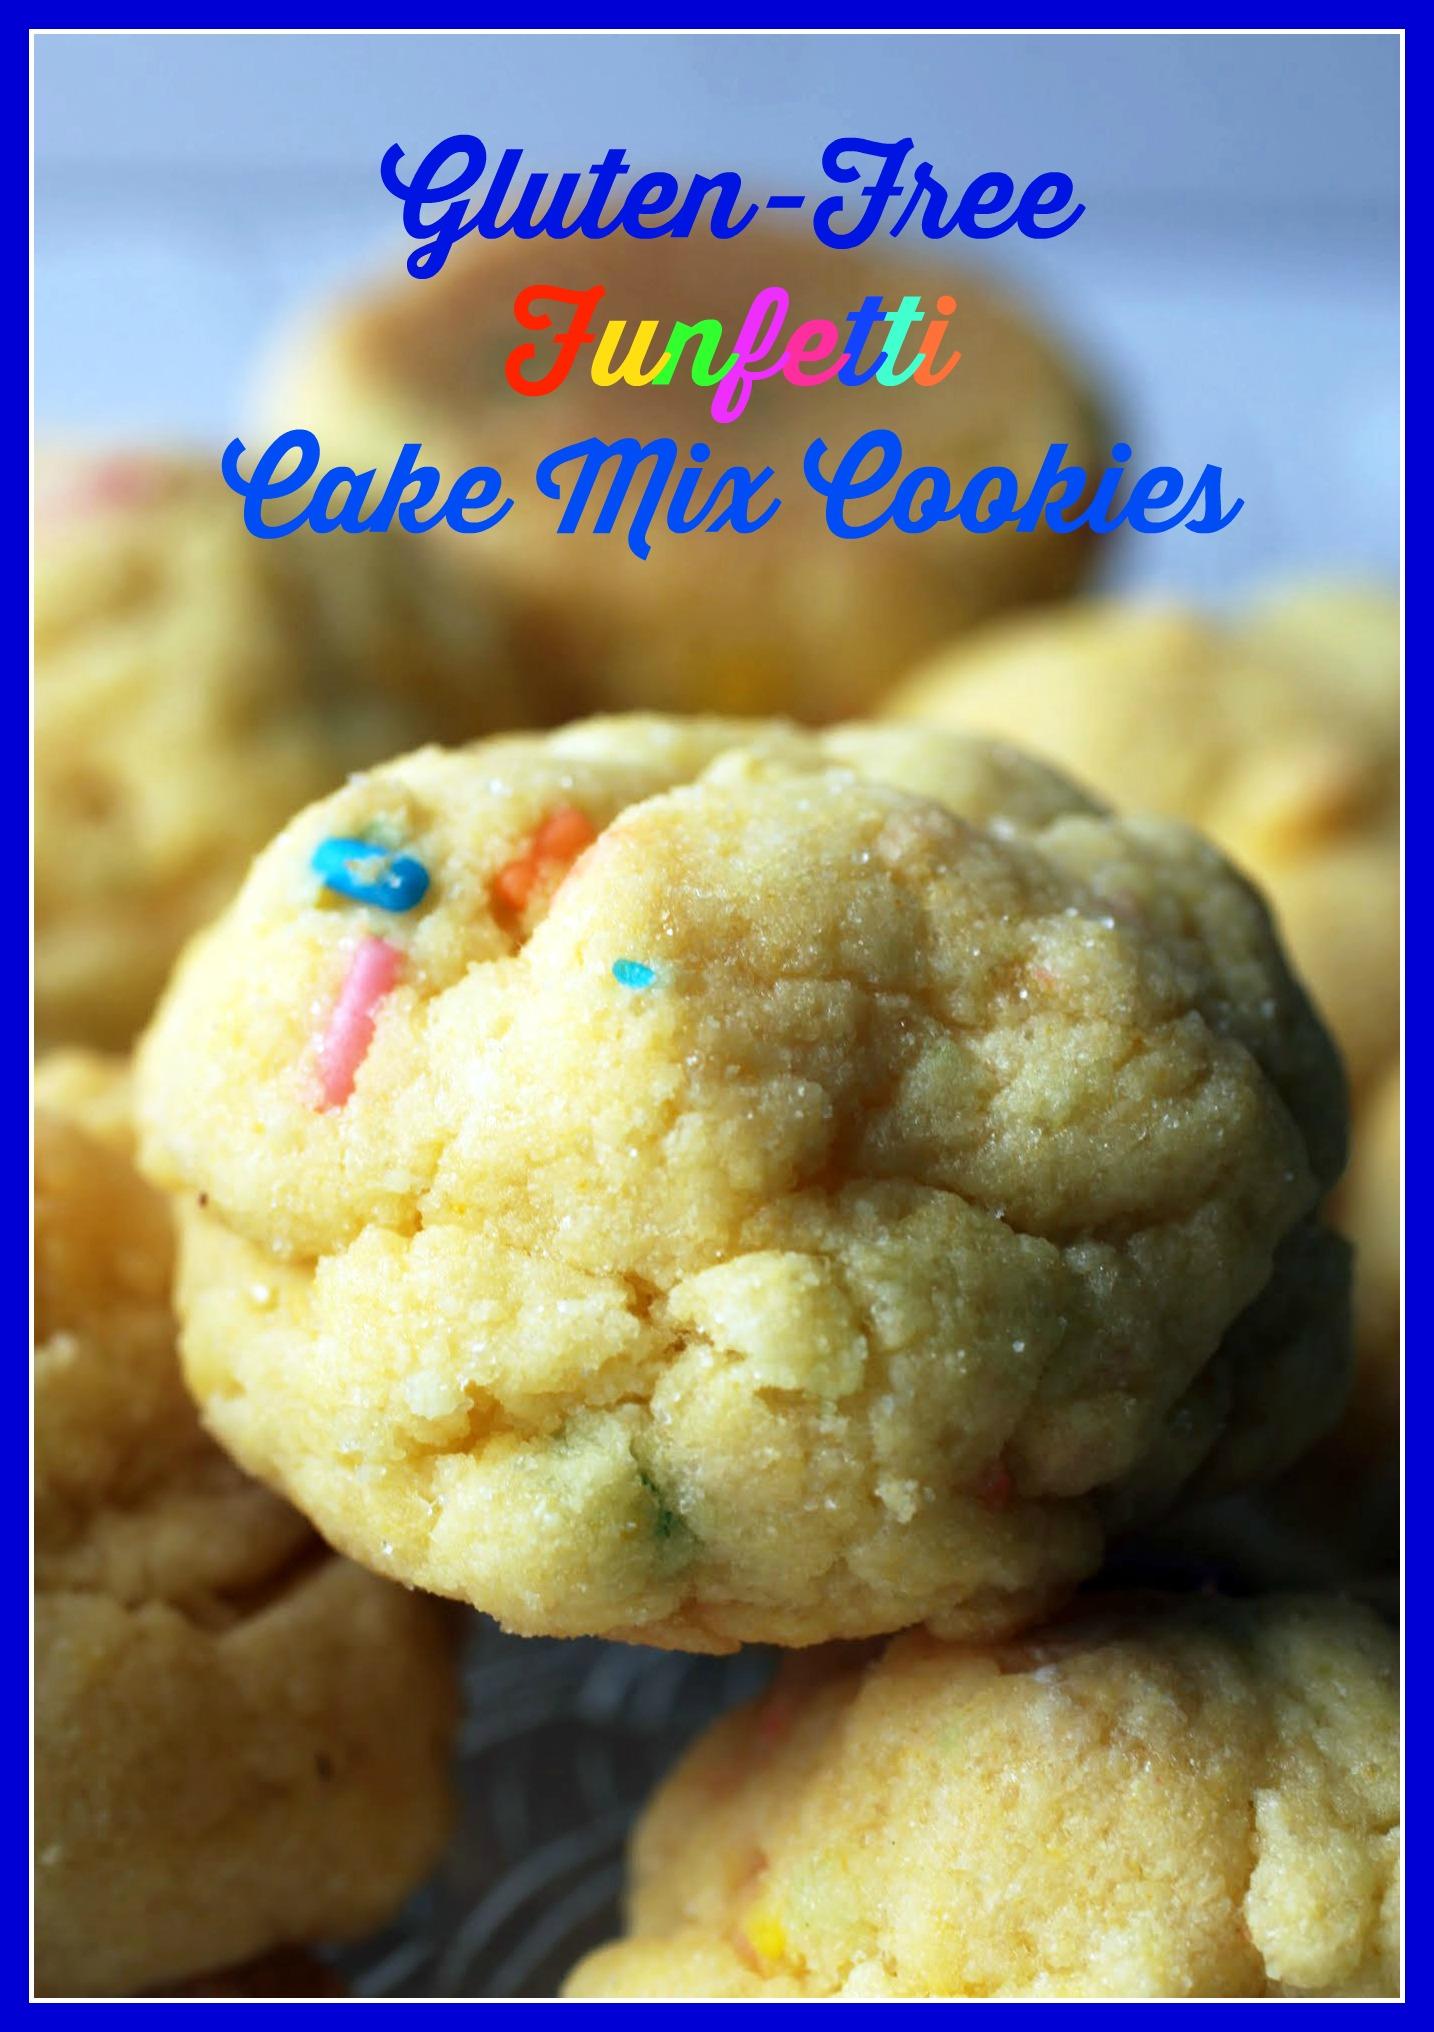 Funfetti Cake Mix Cookies (GF)